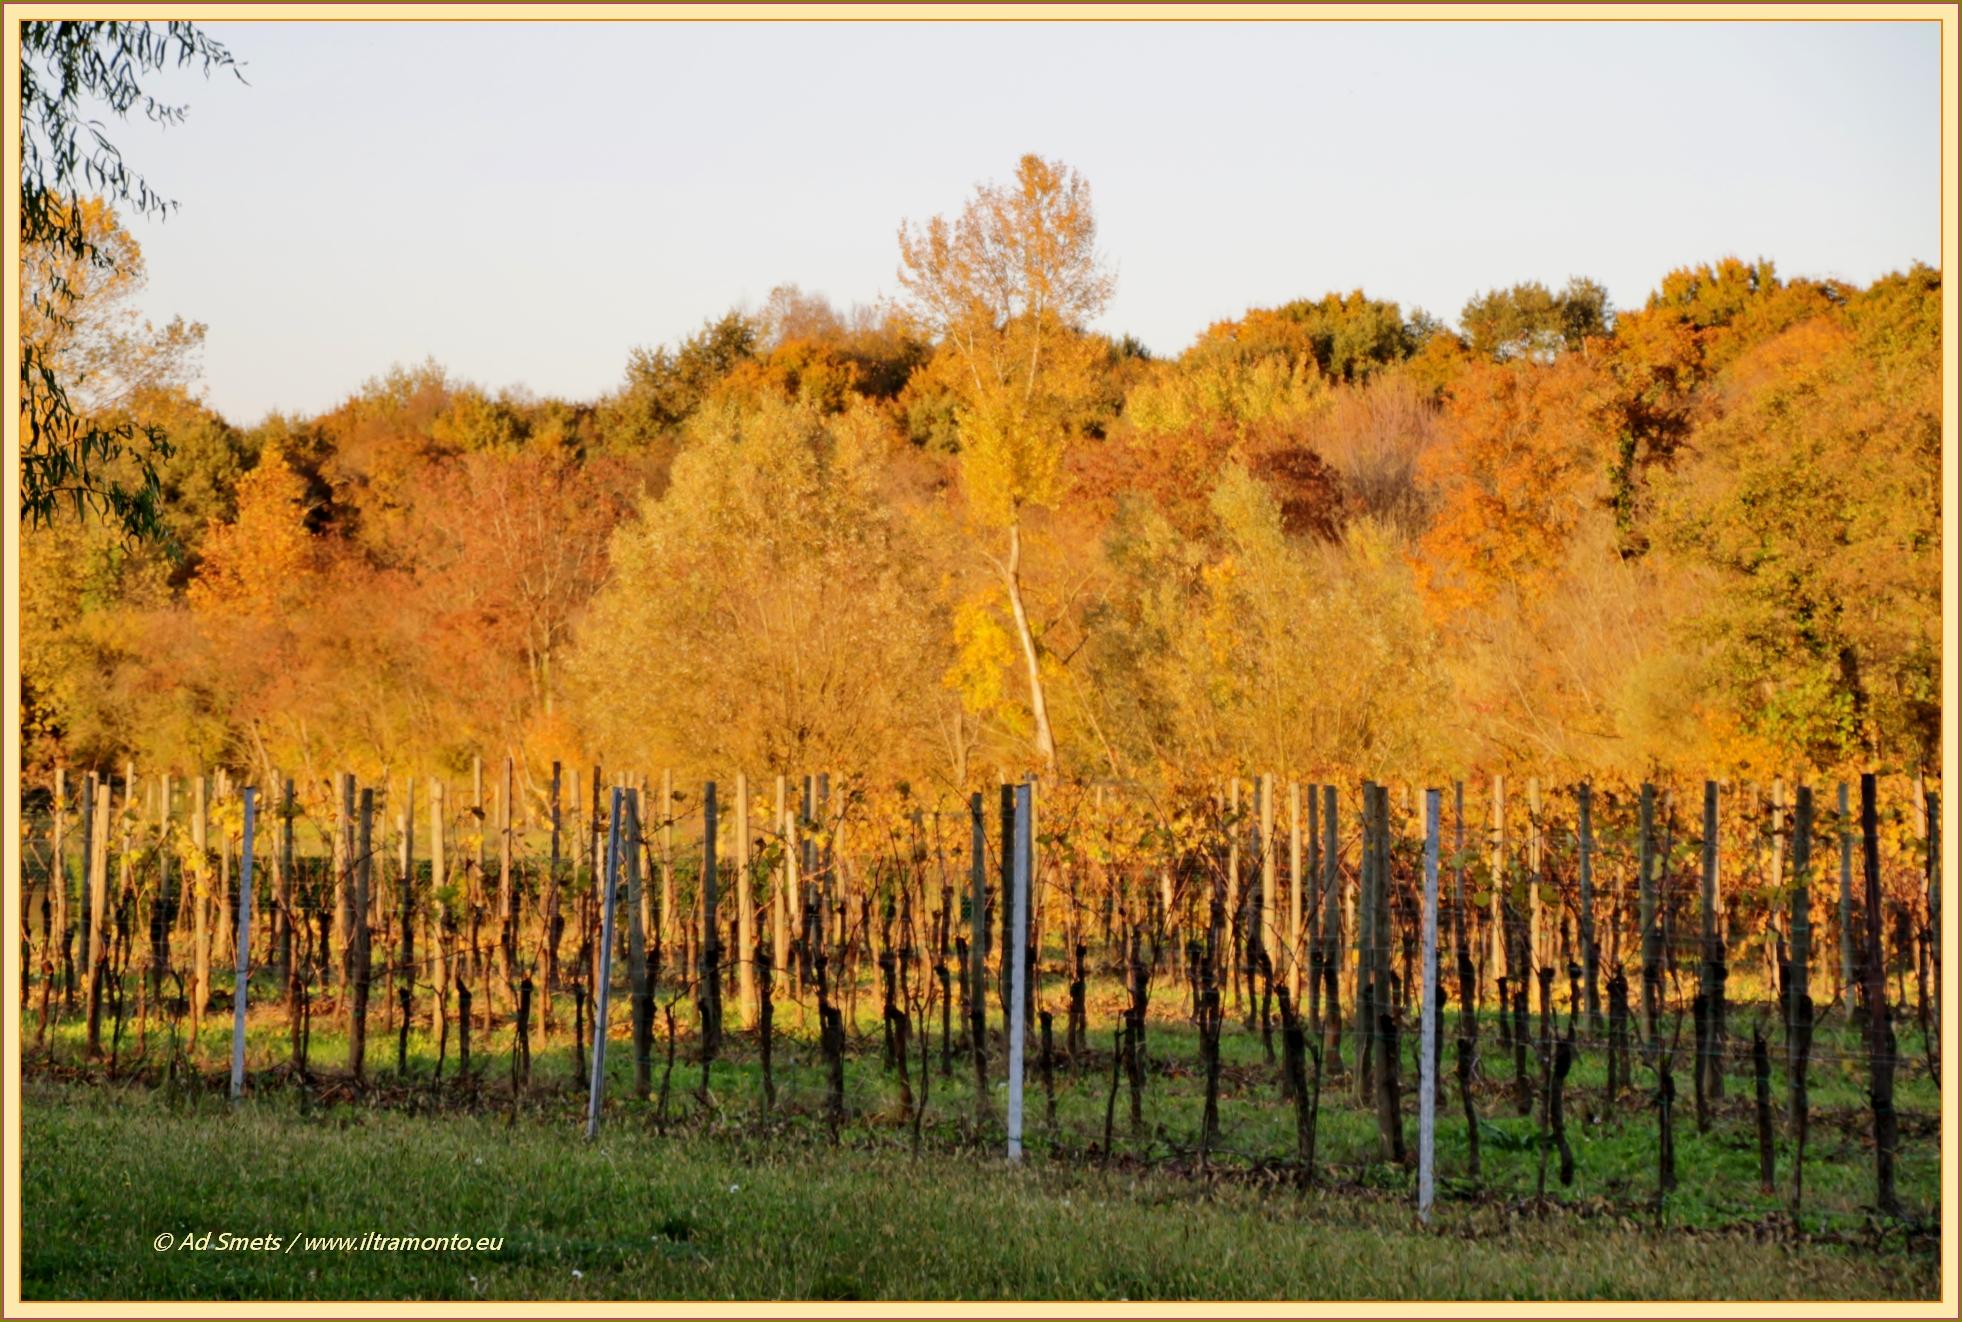 herfst_9246_il-tramonto